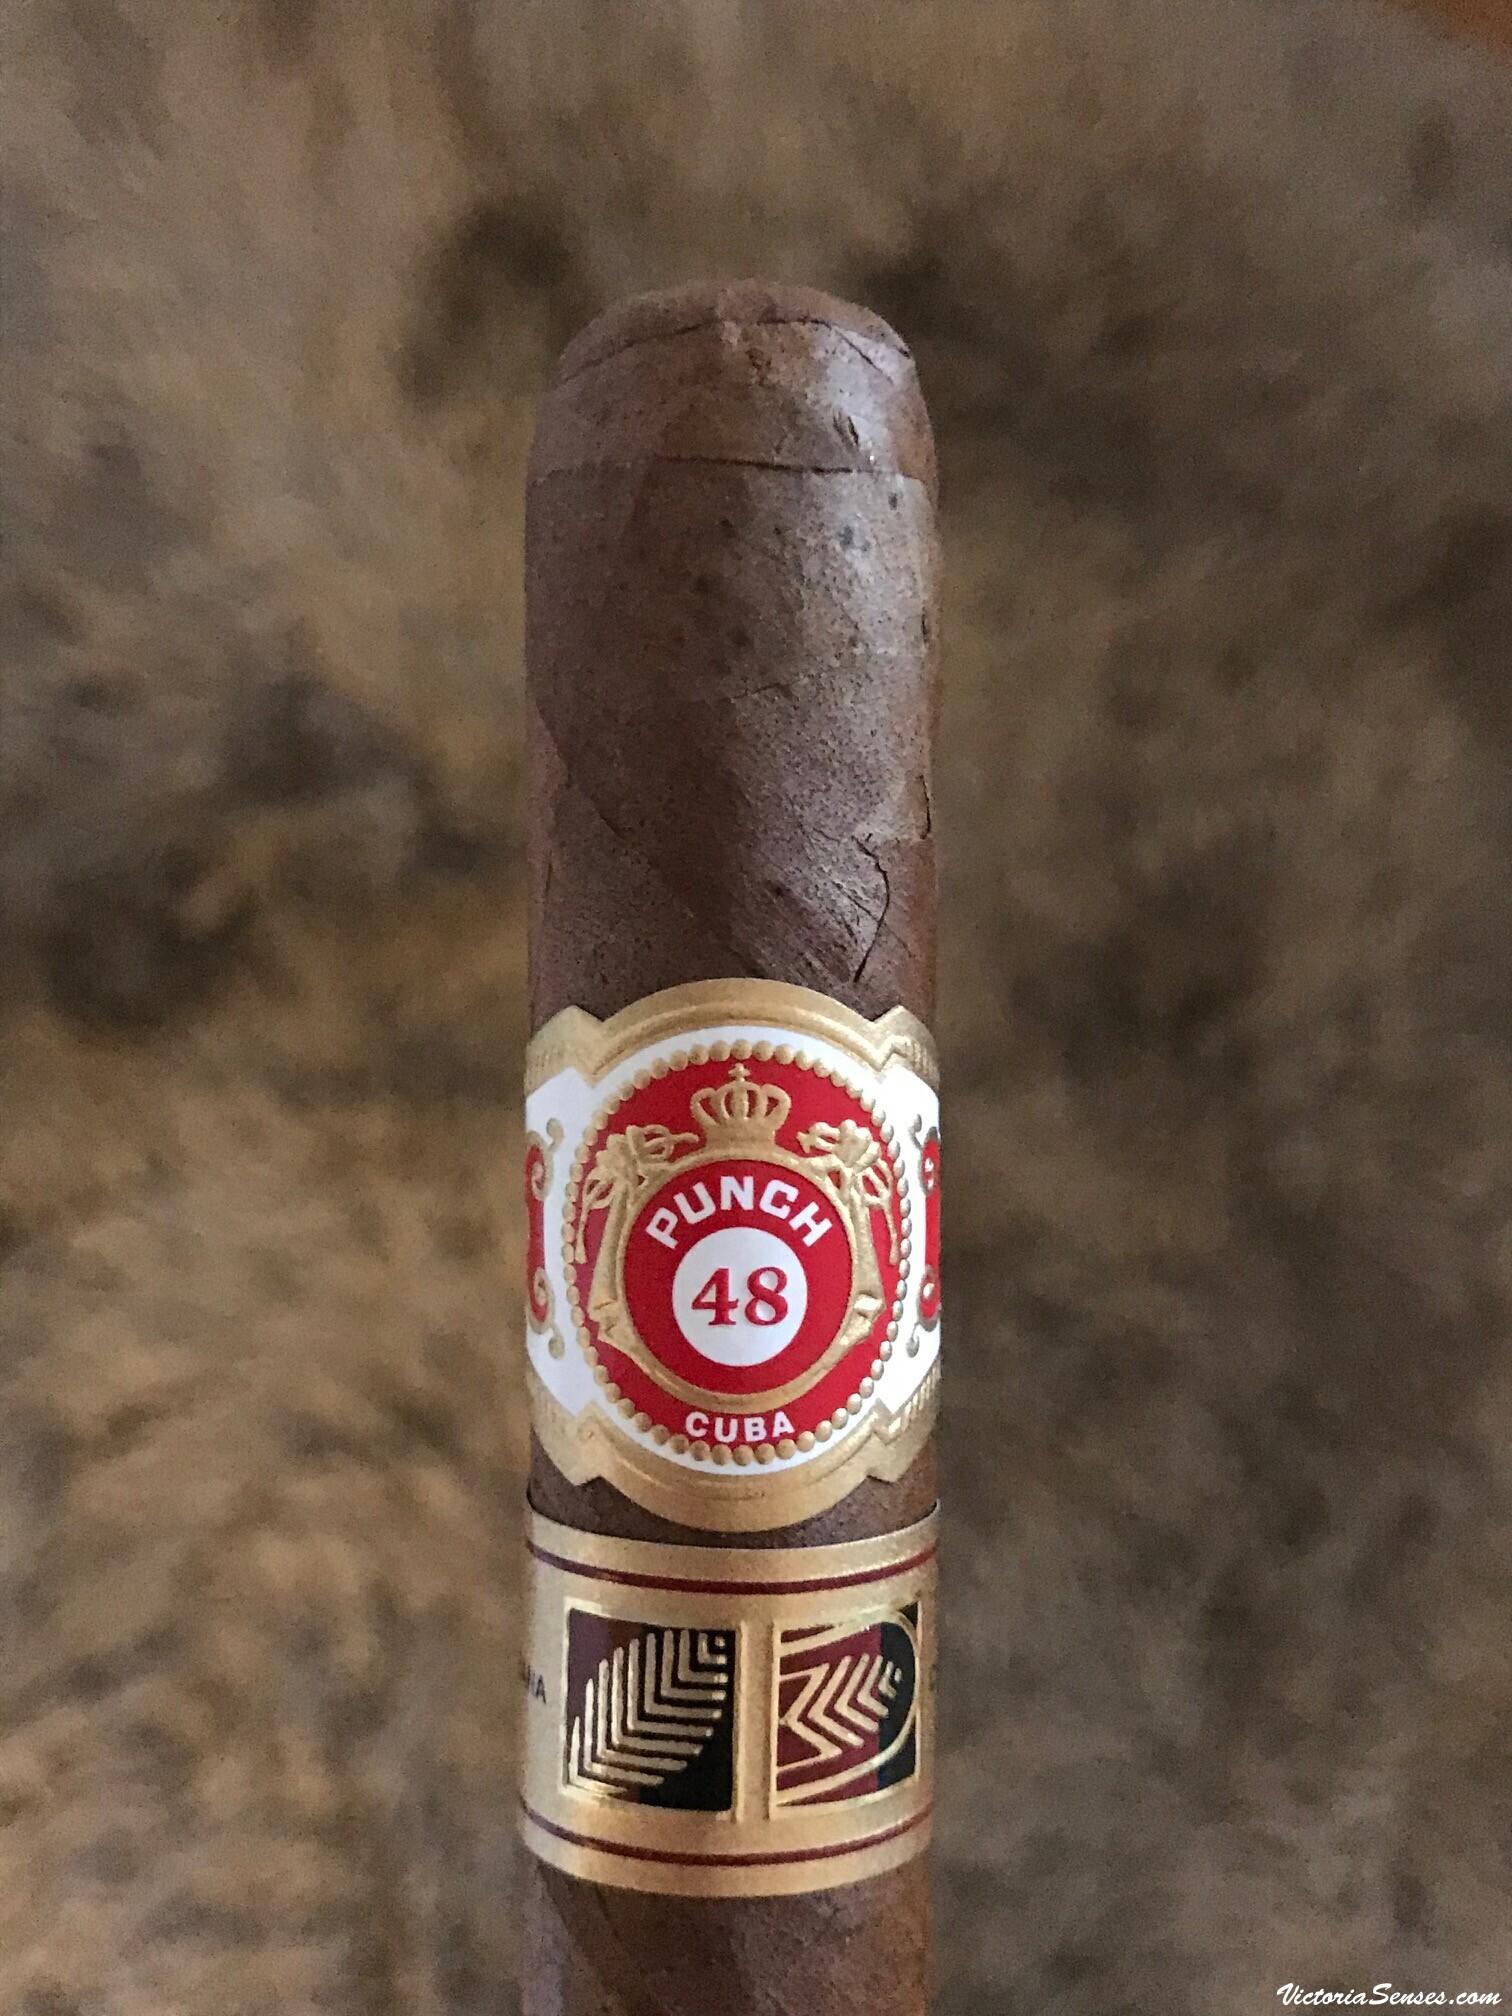 cigar reviews punch punch 48 review, Victoria Radugina.